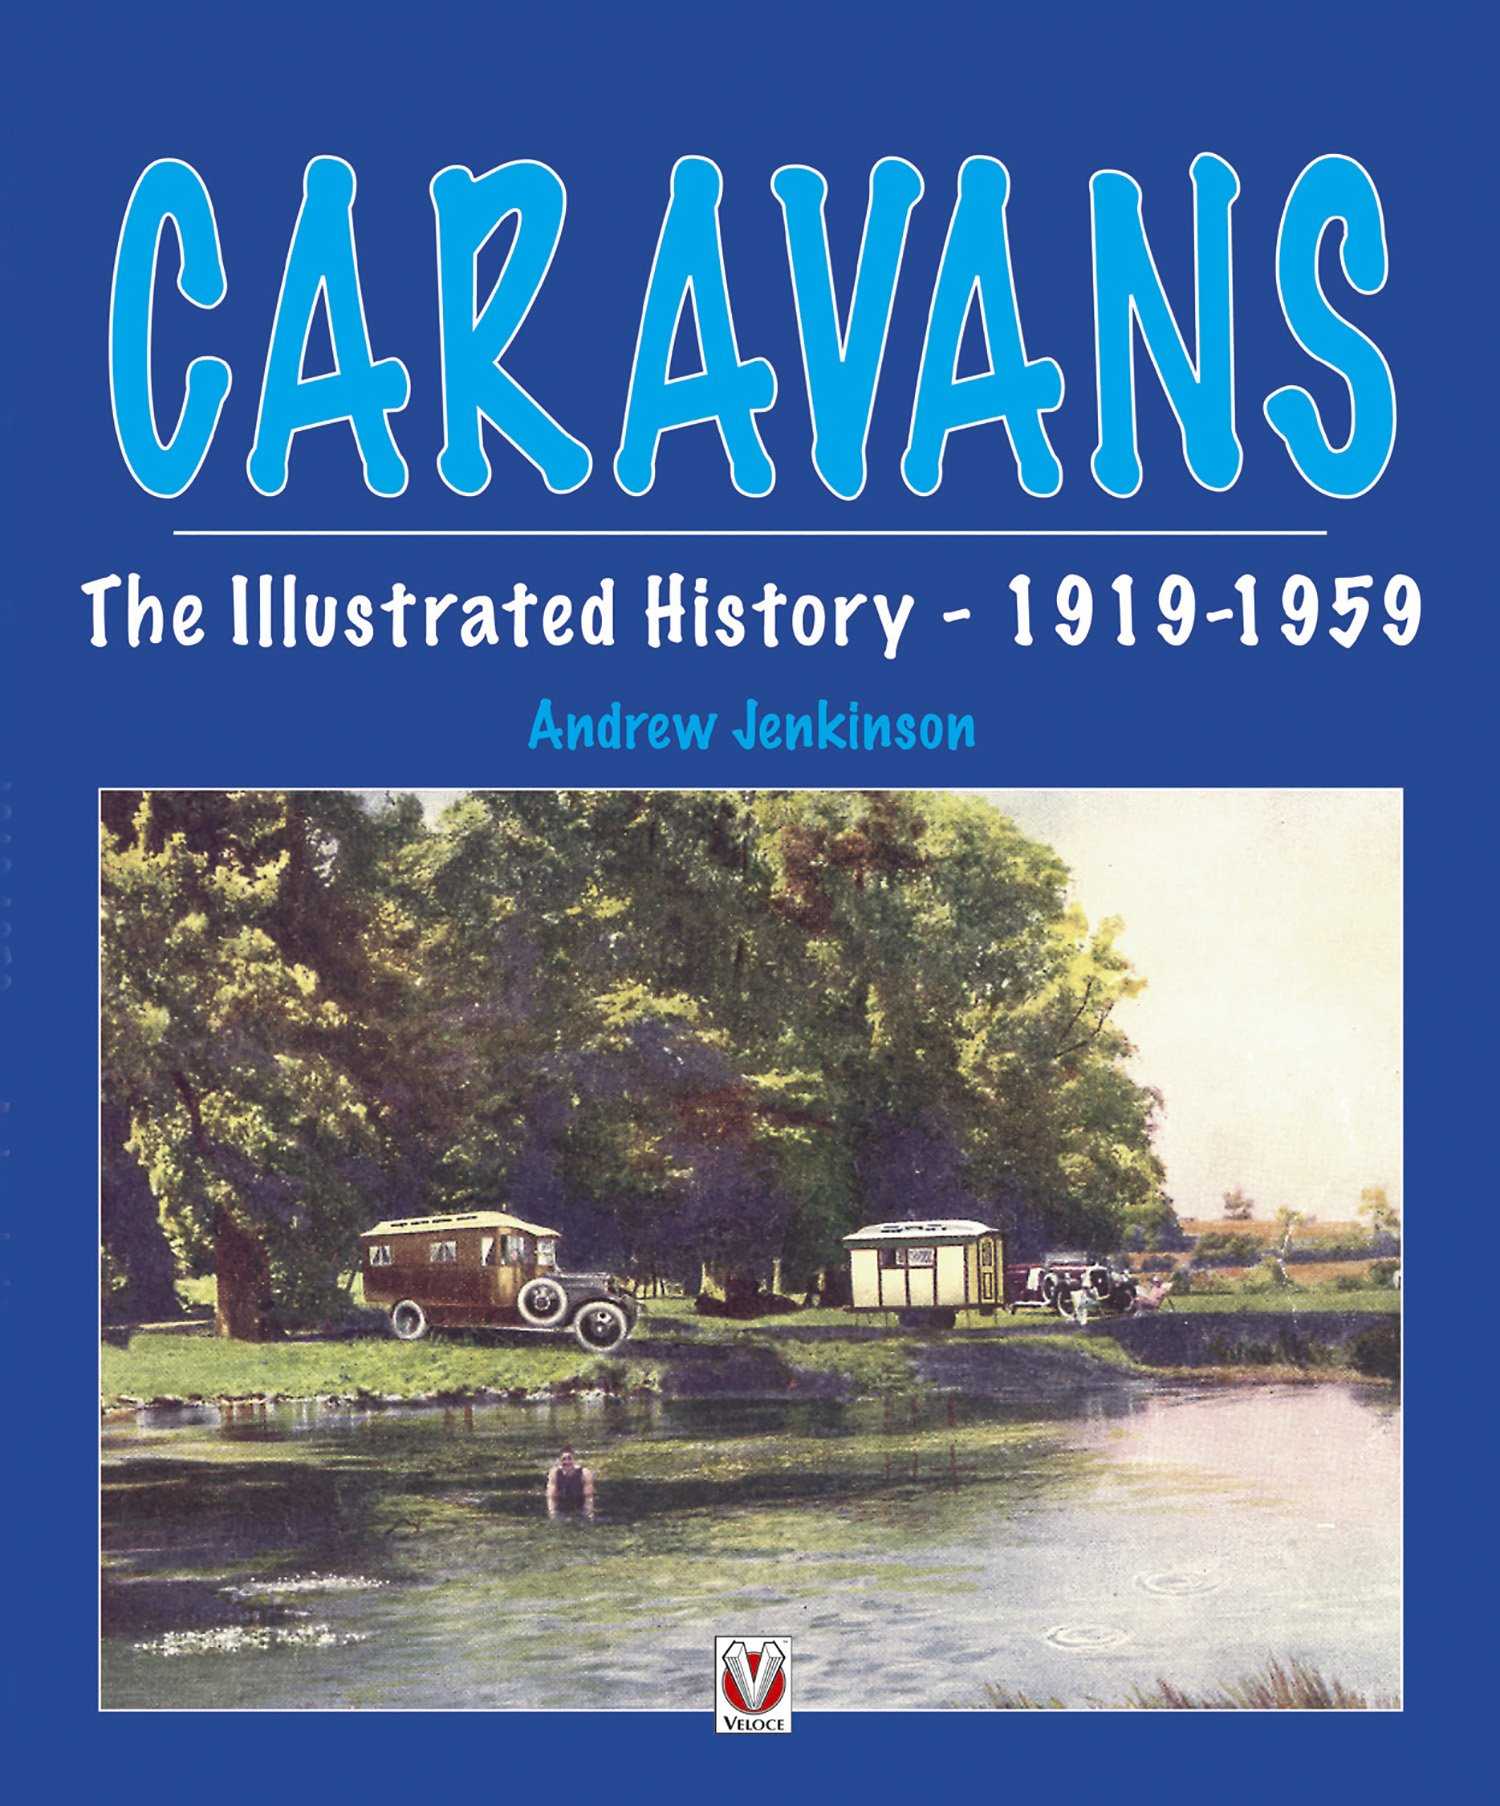 Caravans, The Illustrated History 1919-1959 por Andrew Jenkinson